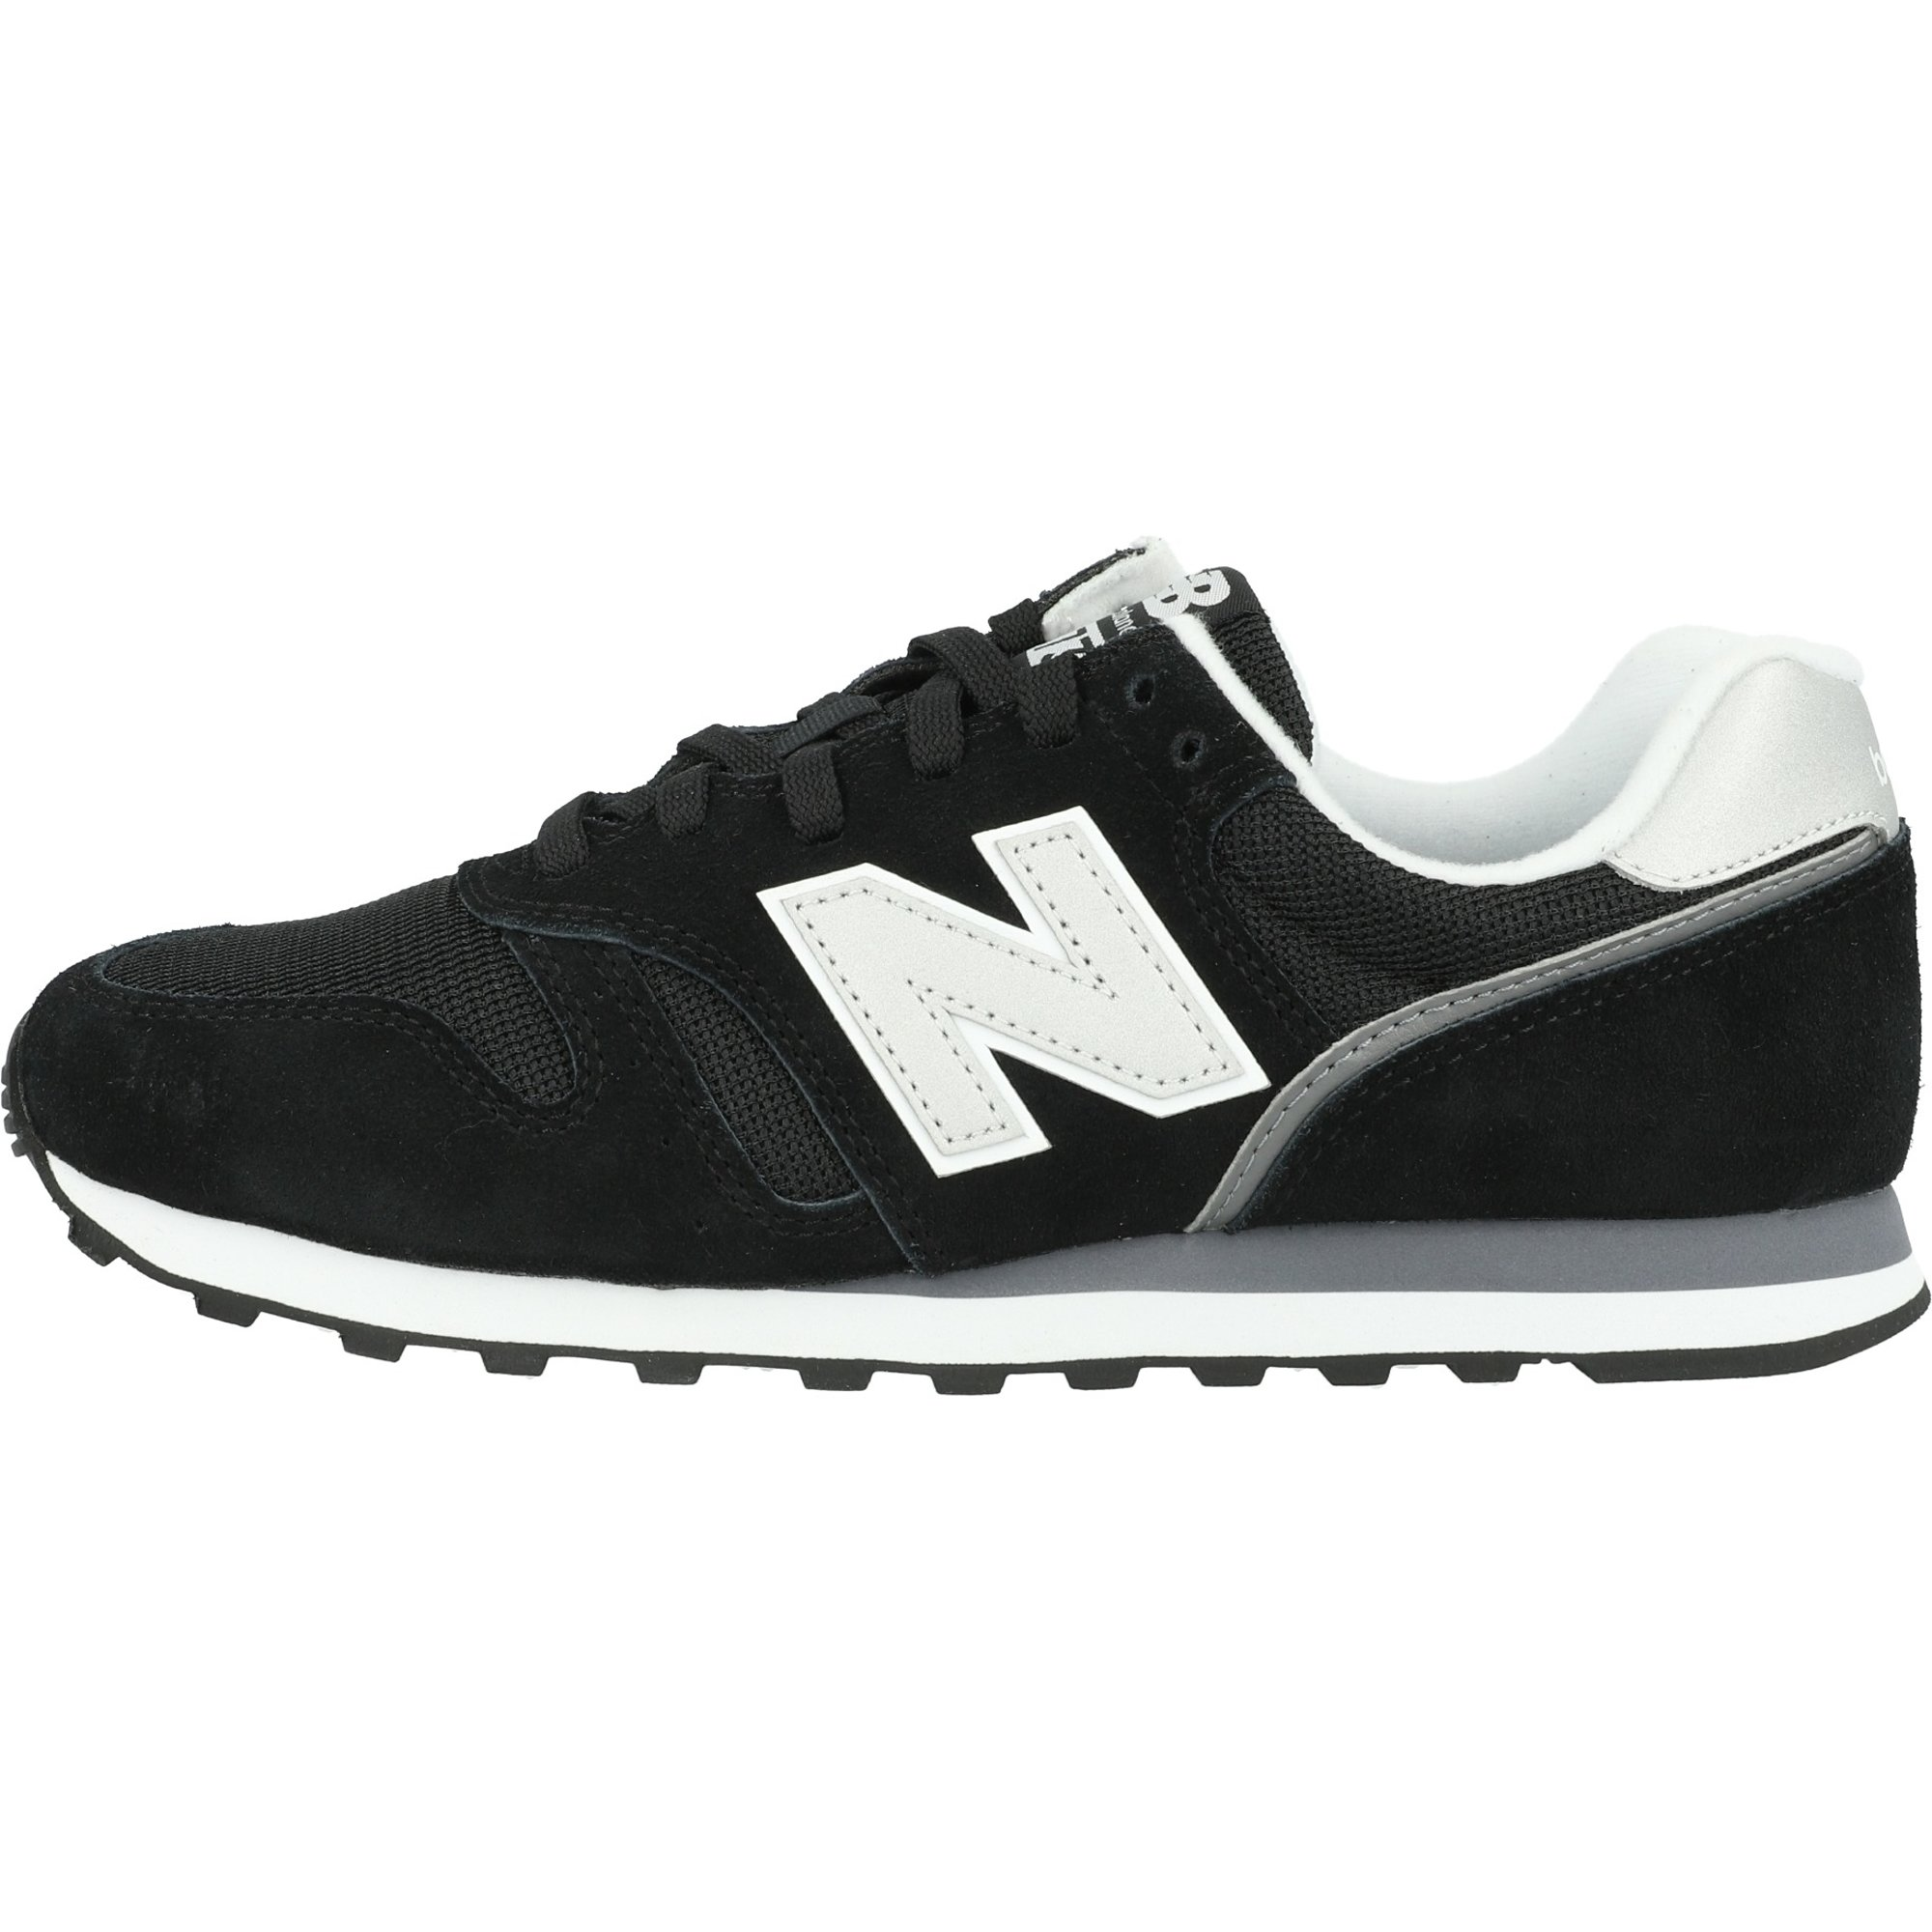 New Balance 373 Black/White Suede